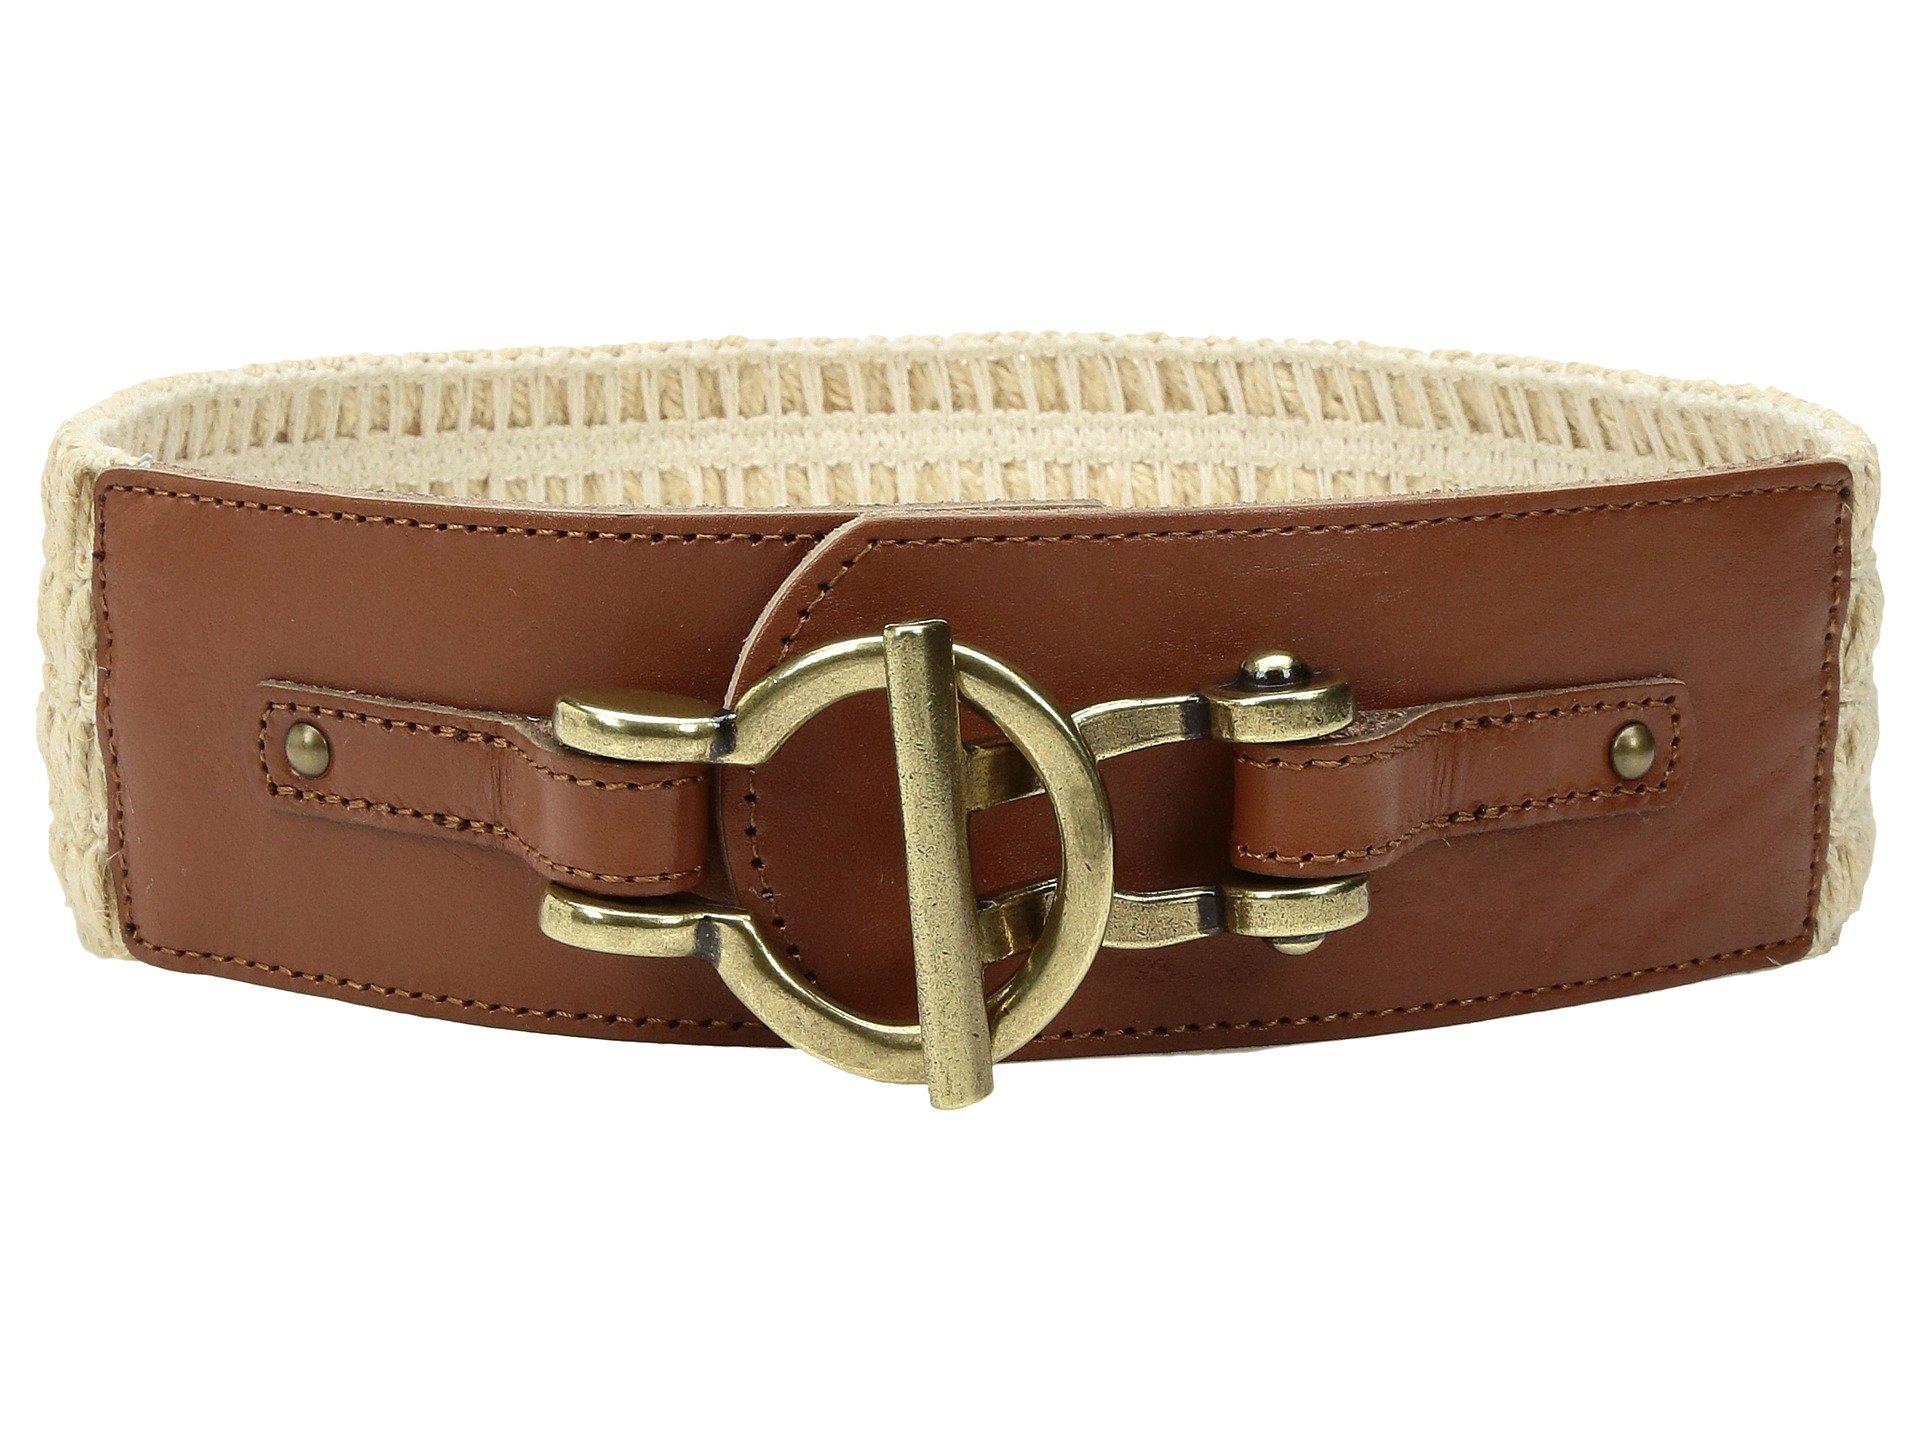 Correa o Cinturon para Mujer Fossil Macrame Stretch Belt  + Fossil en VeoyCompro.net